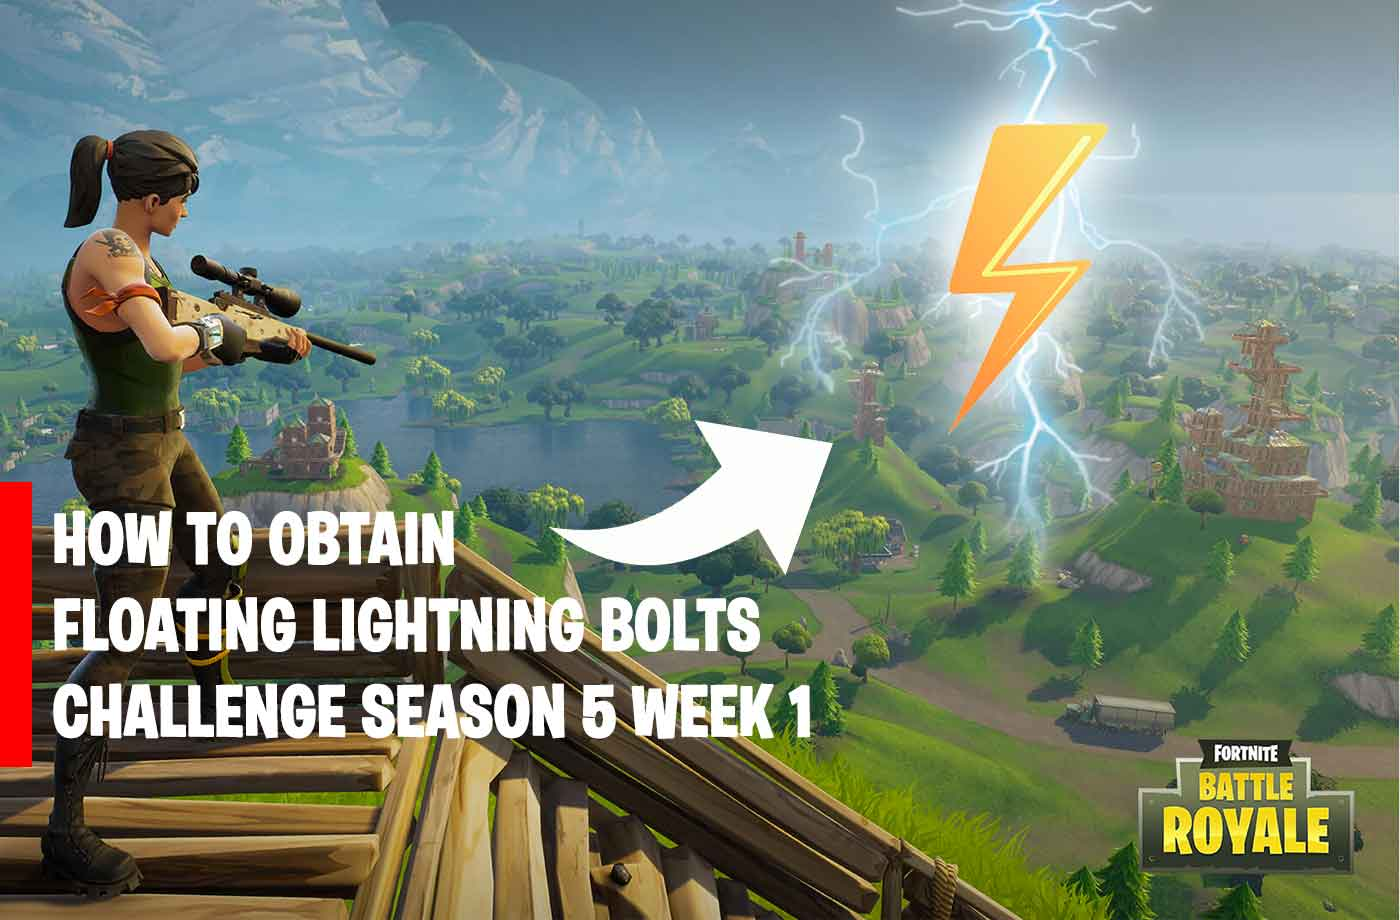 Challenge Fortnite How To Obtain Floating Lightning Bolts Season 5